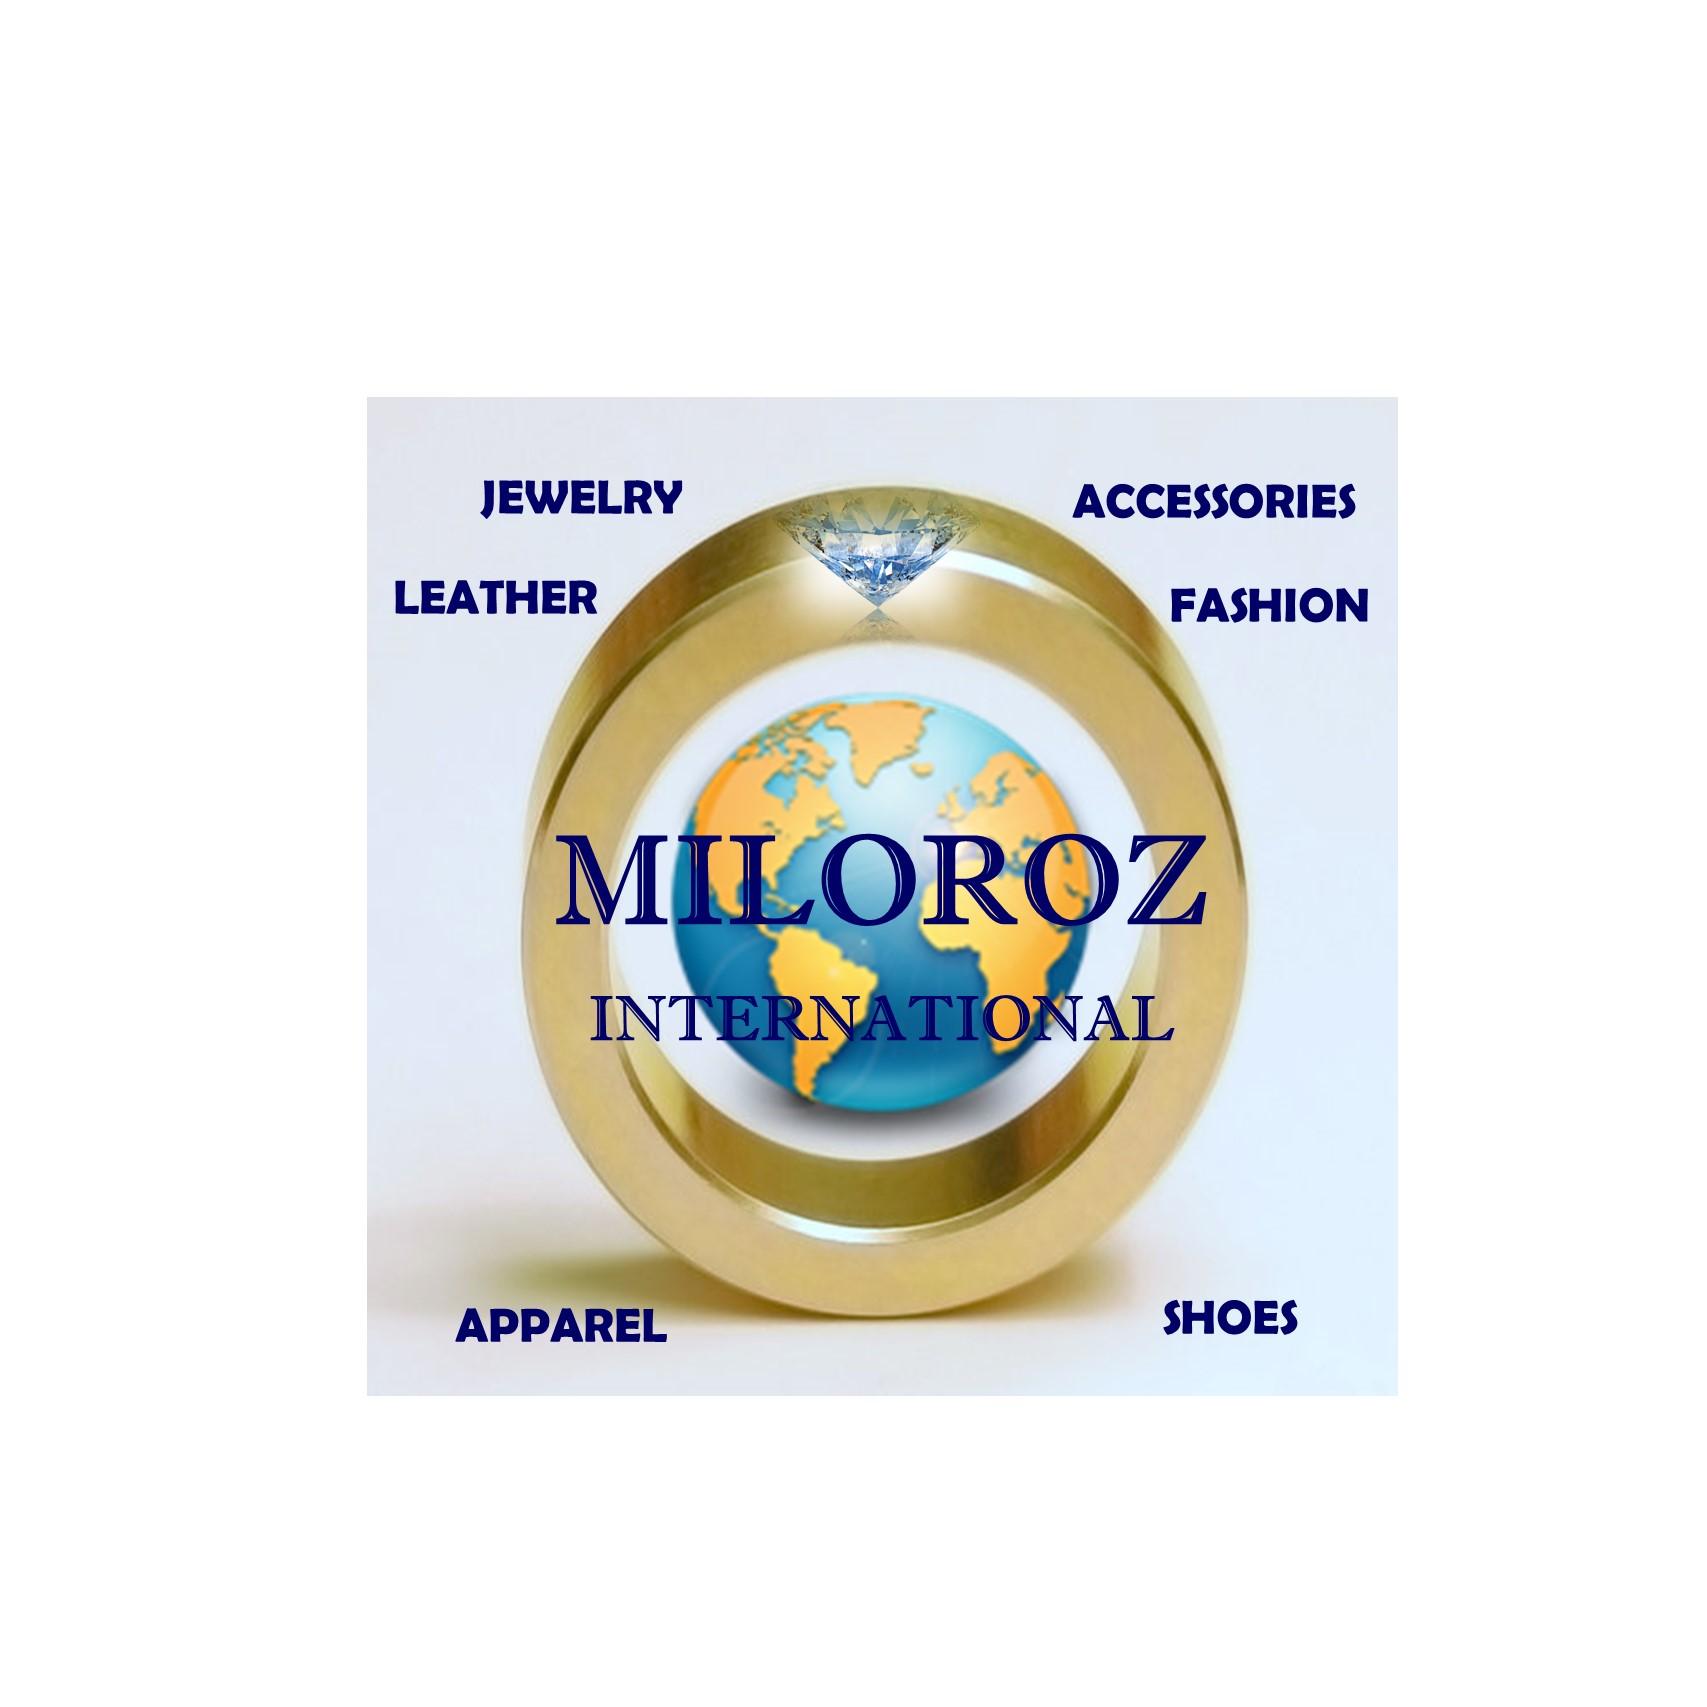 MILOROZ International